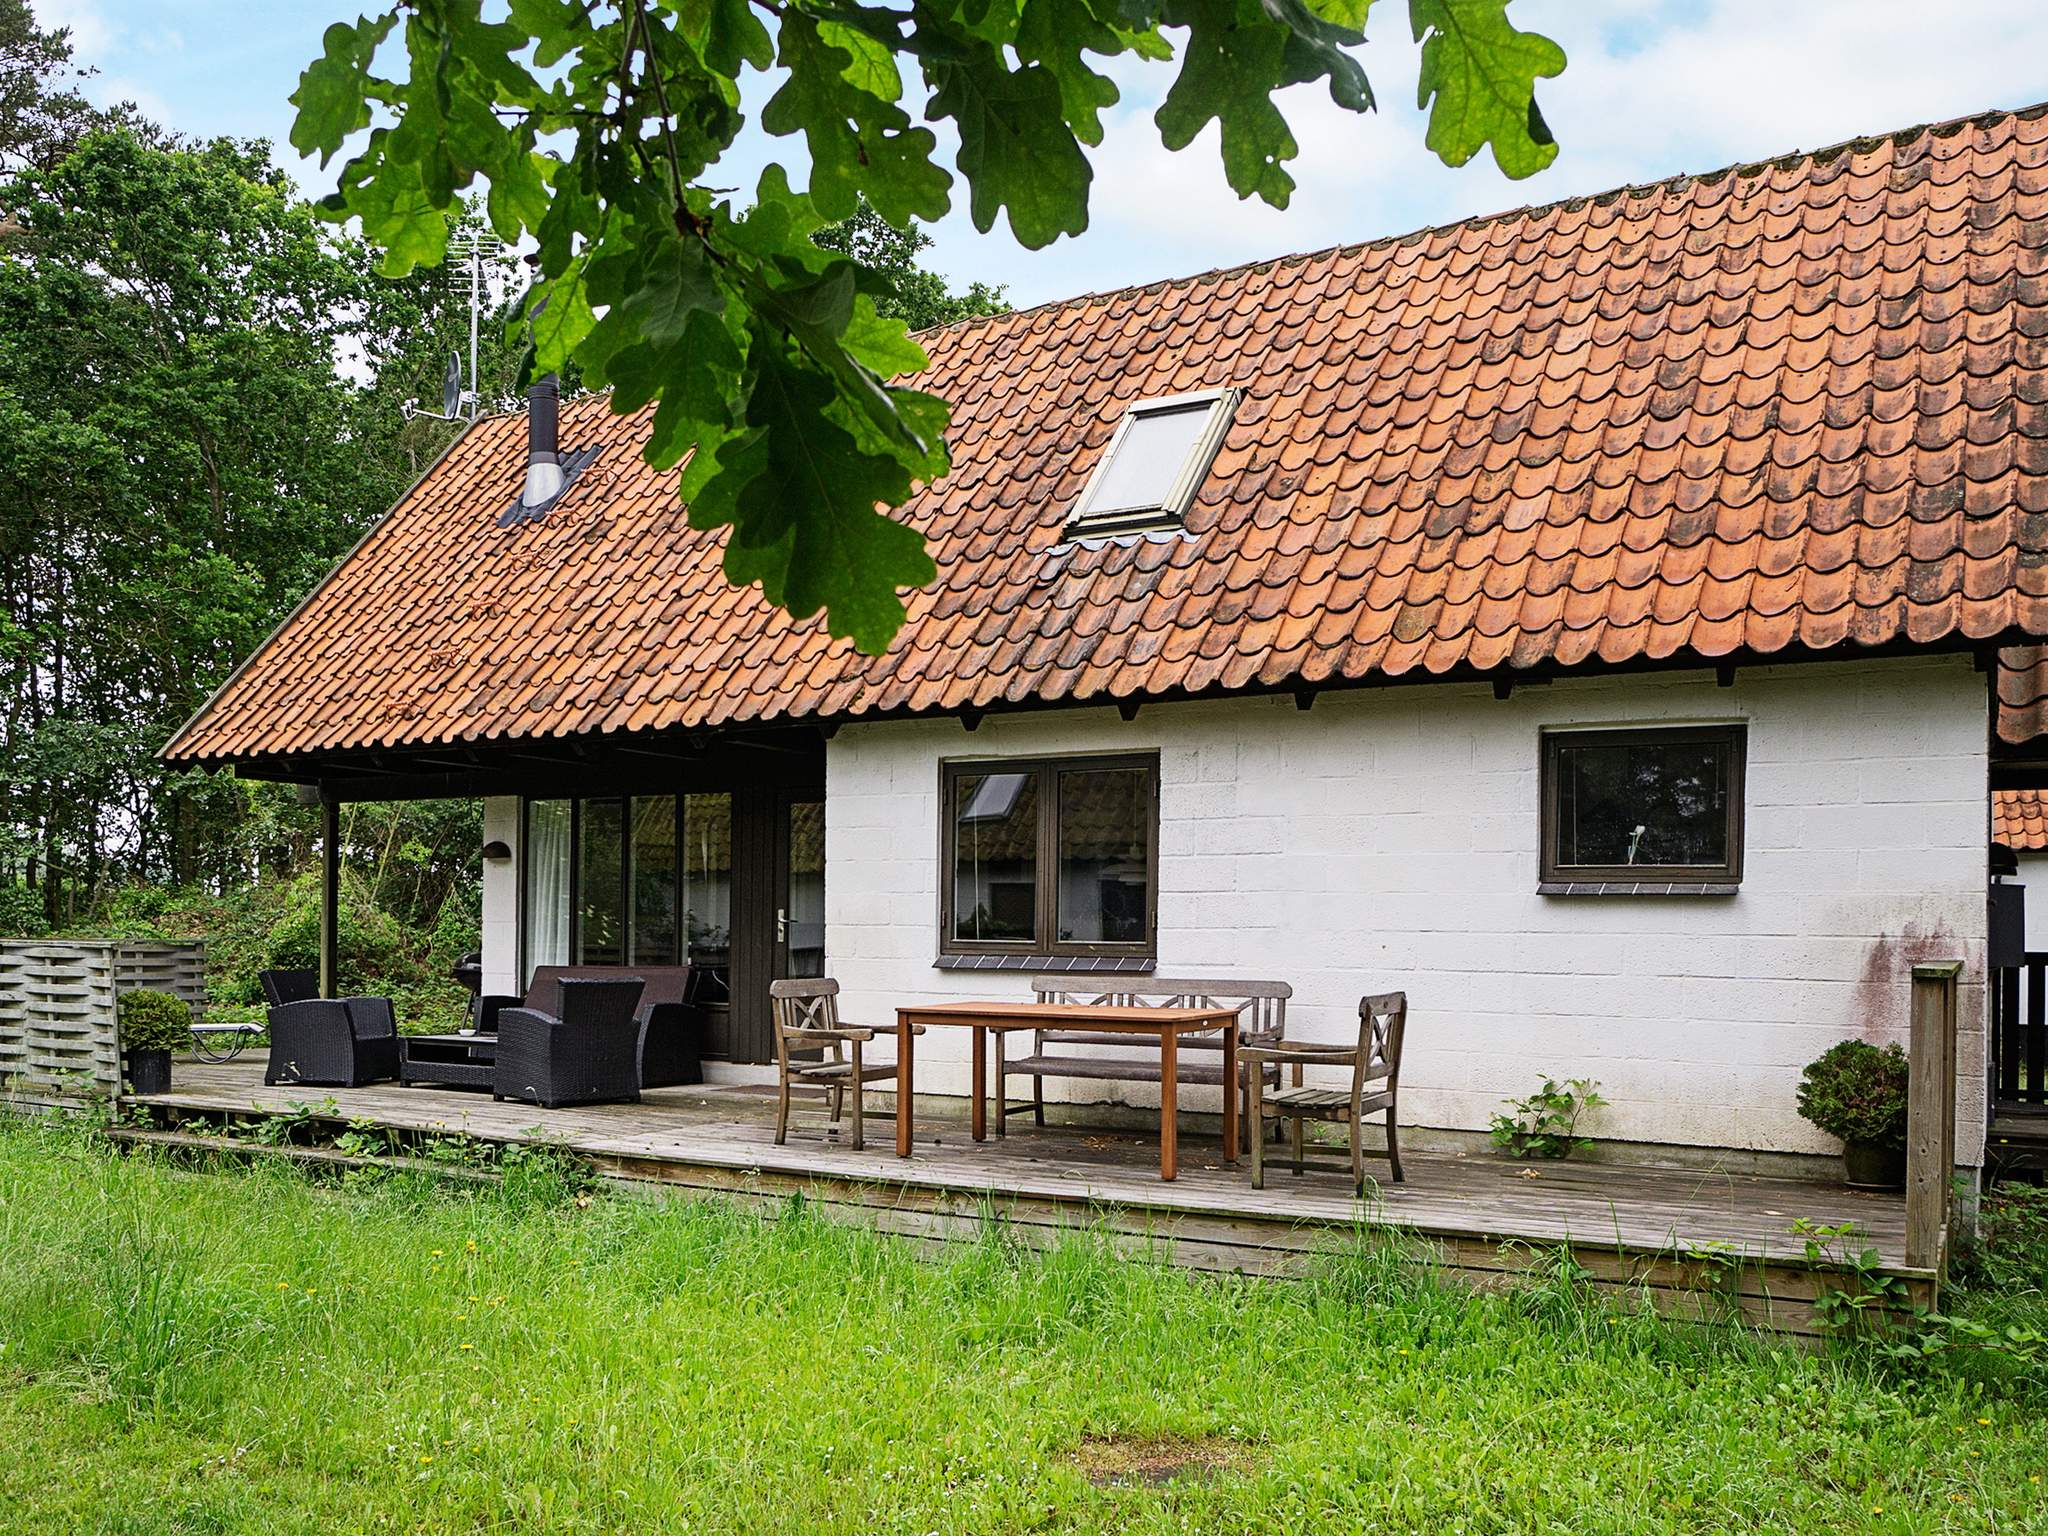 Ferienhaus Balka Strand (660138), Balke, , Bornholm, Dänemark, Bild 12